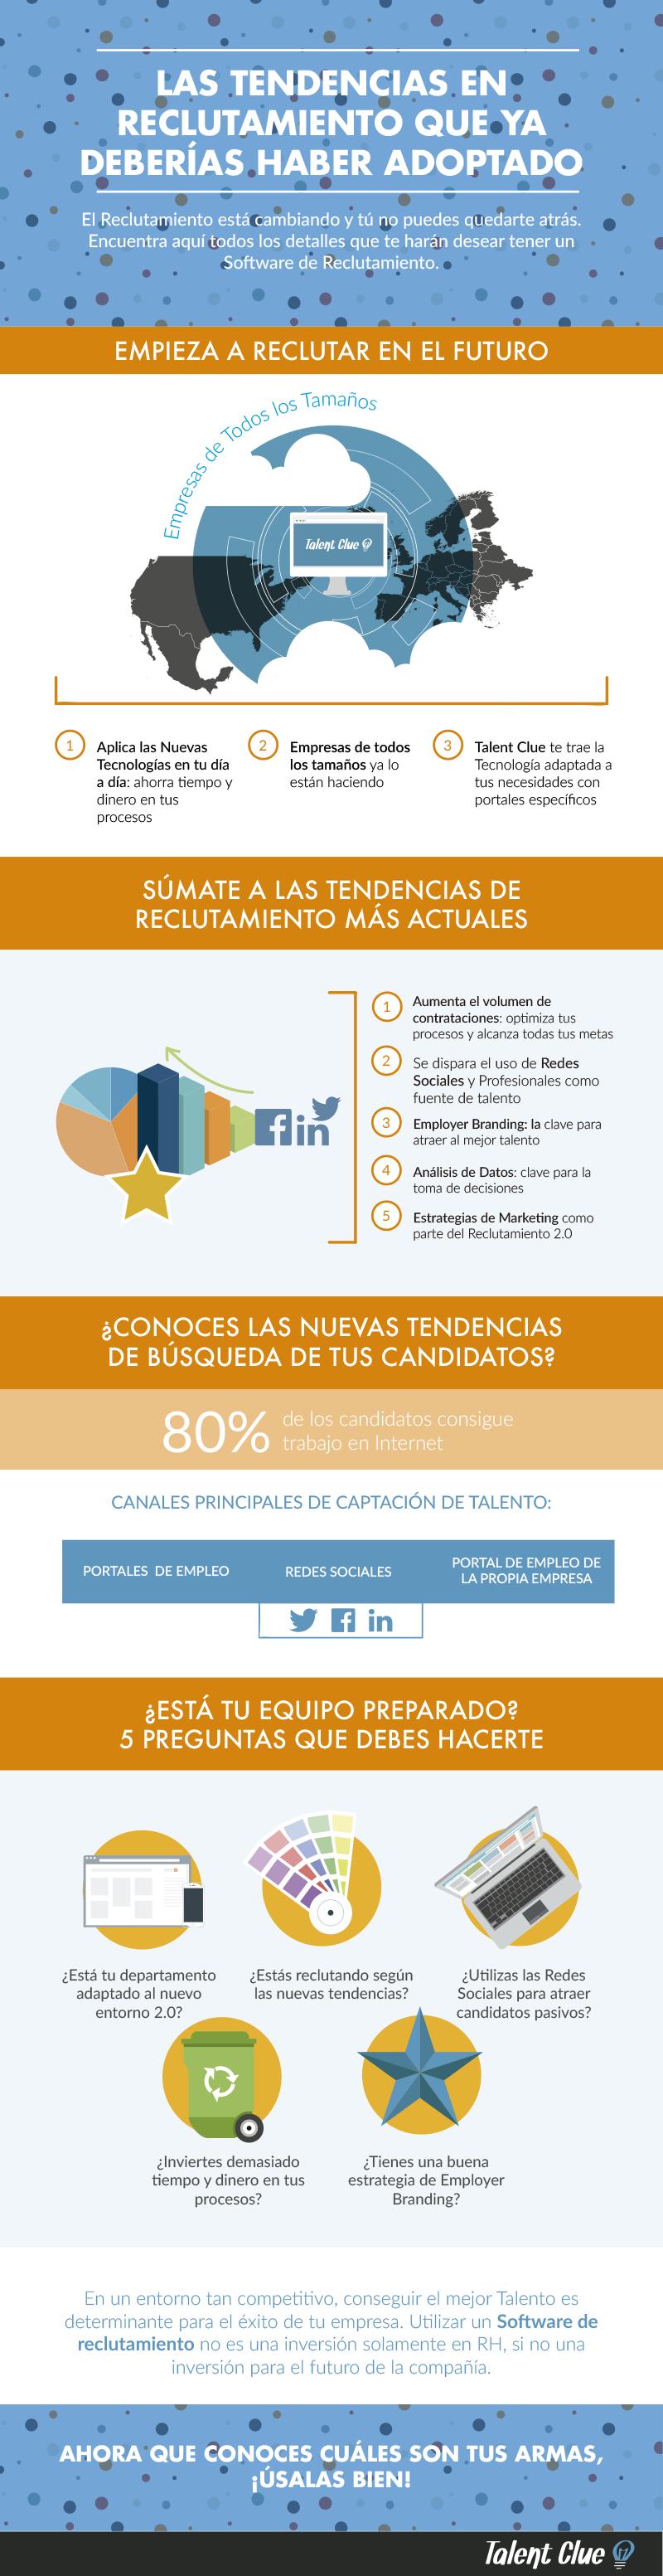 tendencias-reclutamiento-infografia